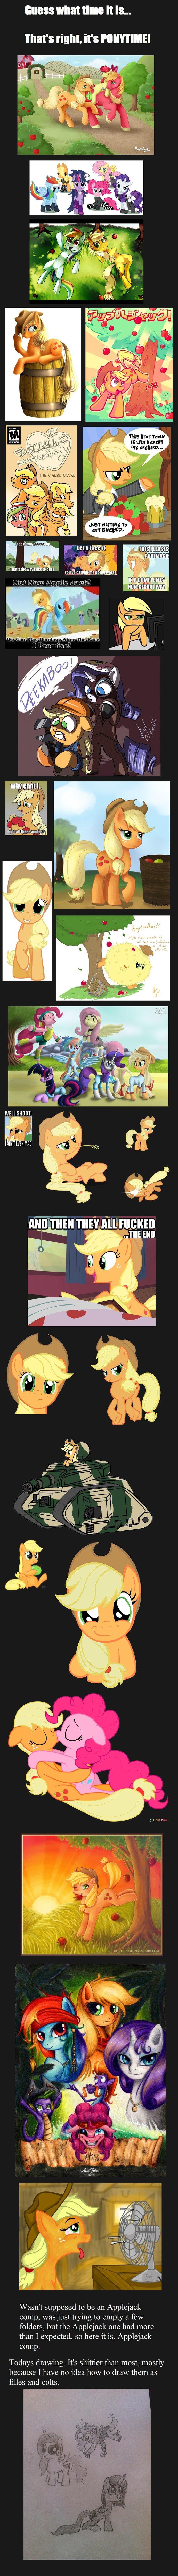 Ponycomp 101. Ponycomp 100: funnyjunk.com/channel/ponytime/Ponycomp+100/pLhTGcY/ DOWNLOAD LINK: www.mediafire.com/?a7jp451yzez5t.. I like this one, My Little Pony ponies ponytime